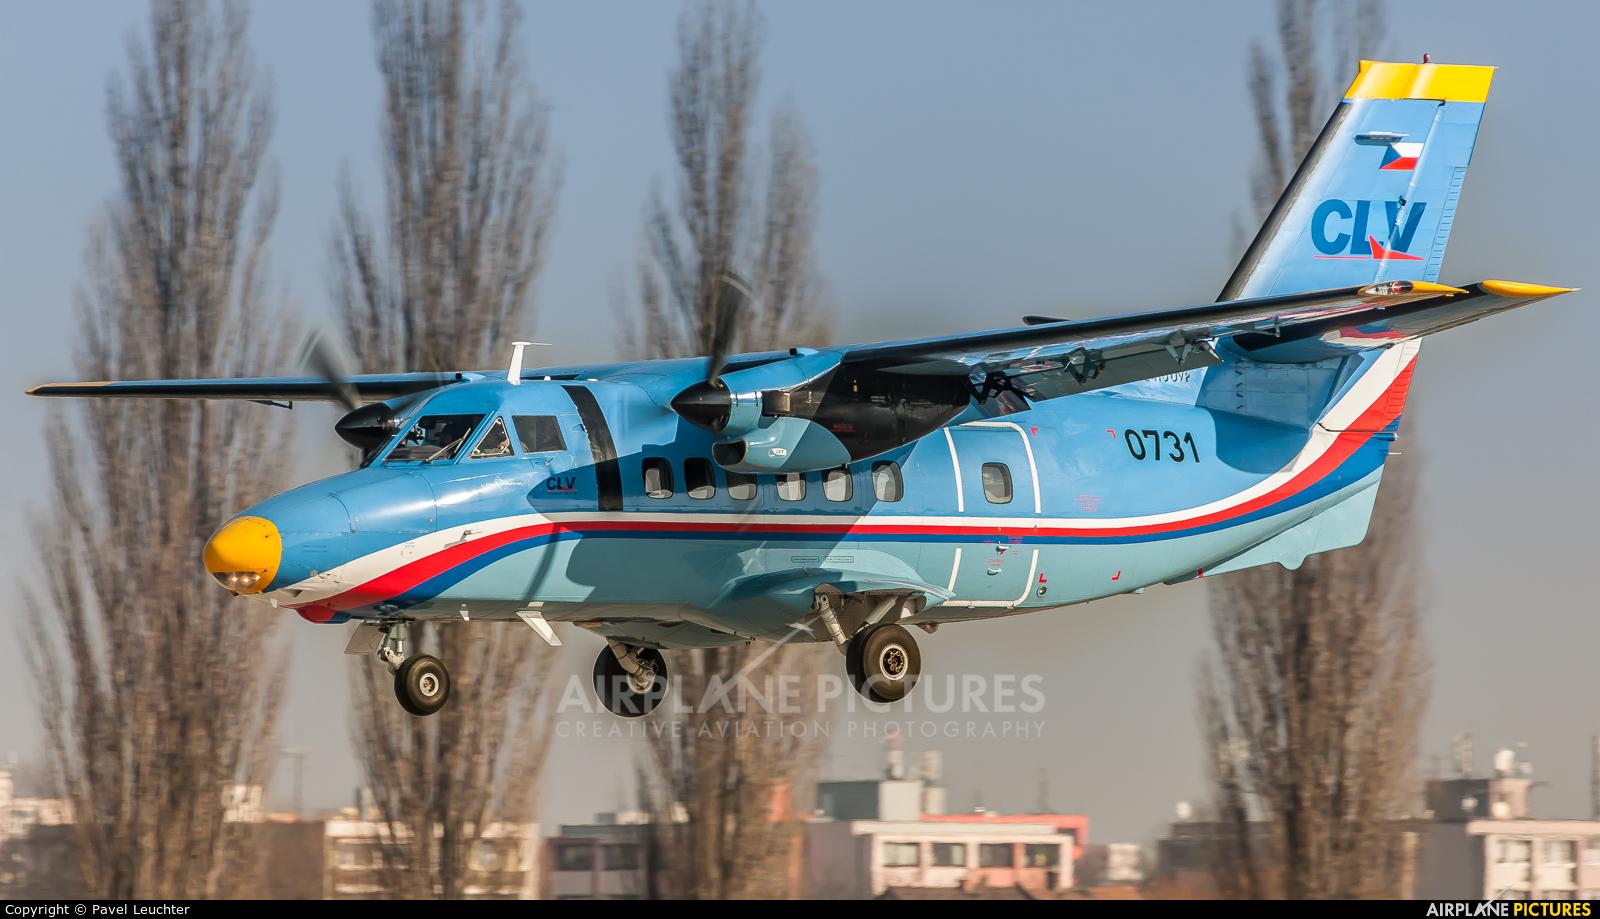 Czech - Air Force 0731 aircraft at Pardubice